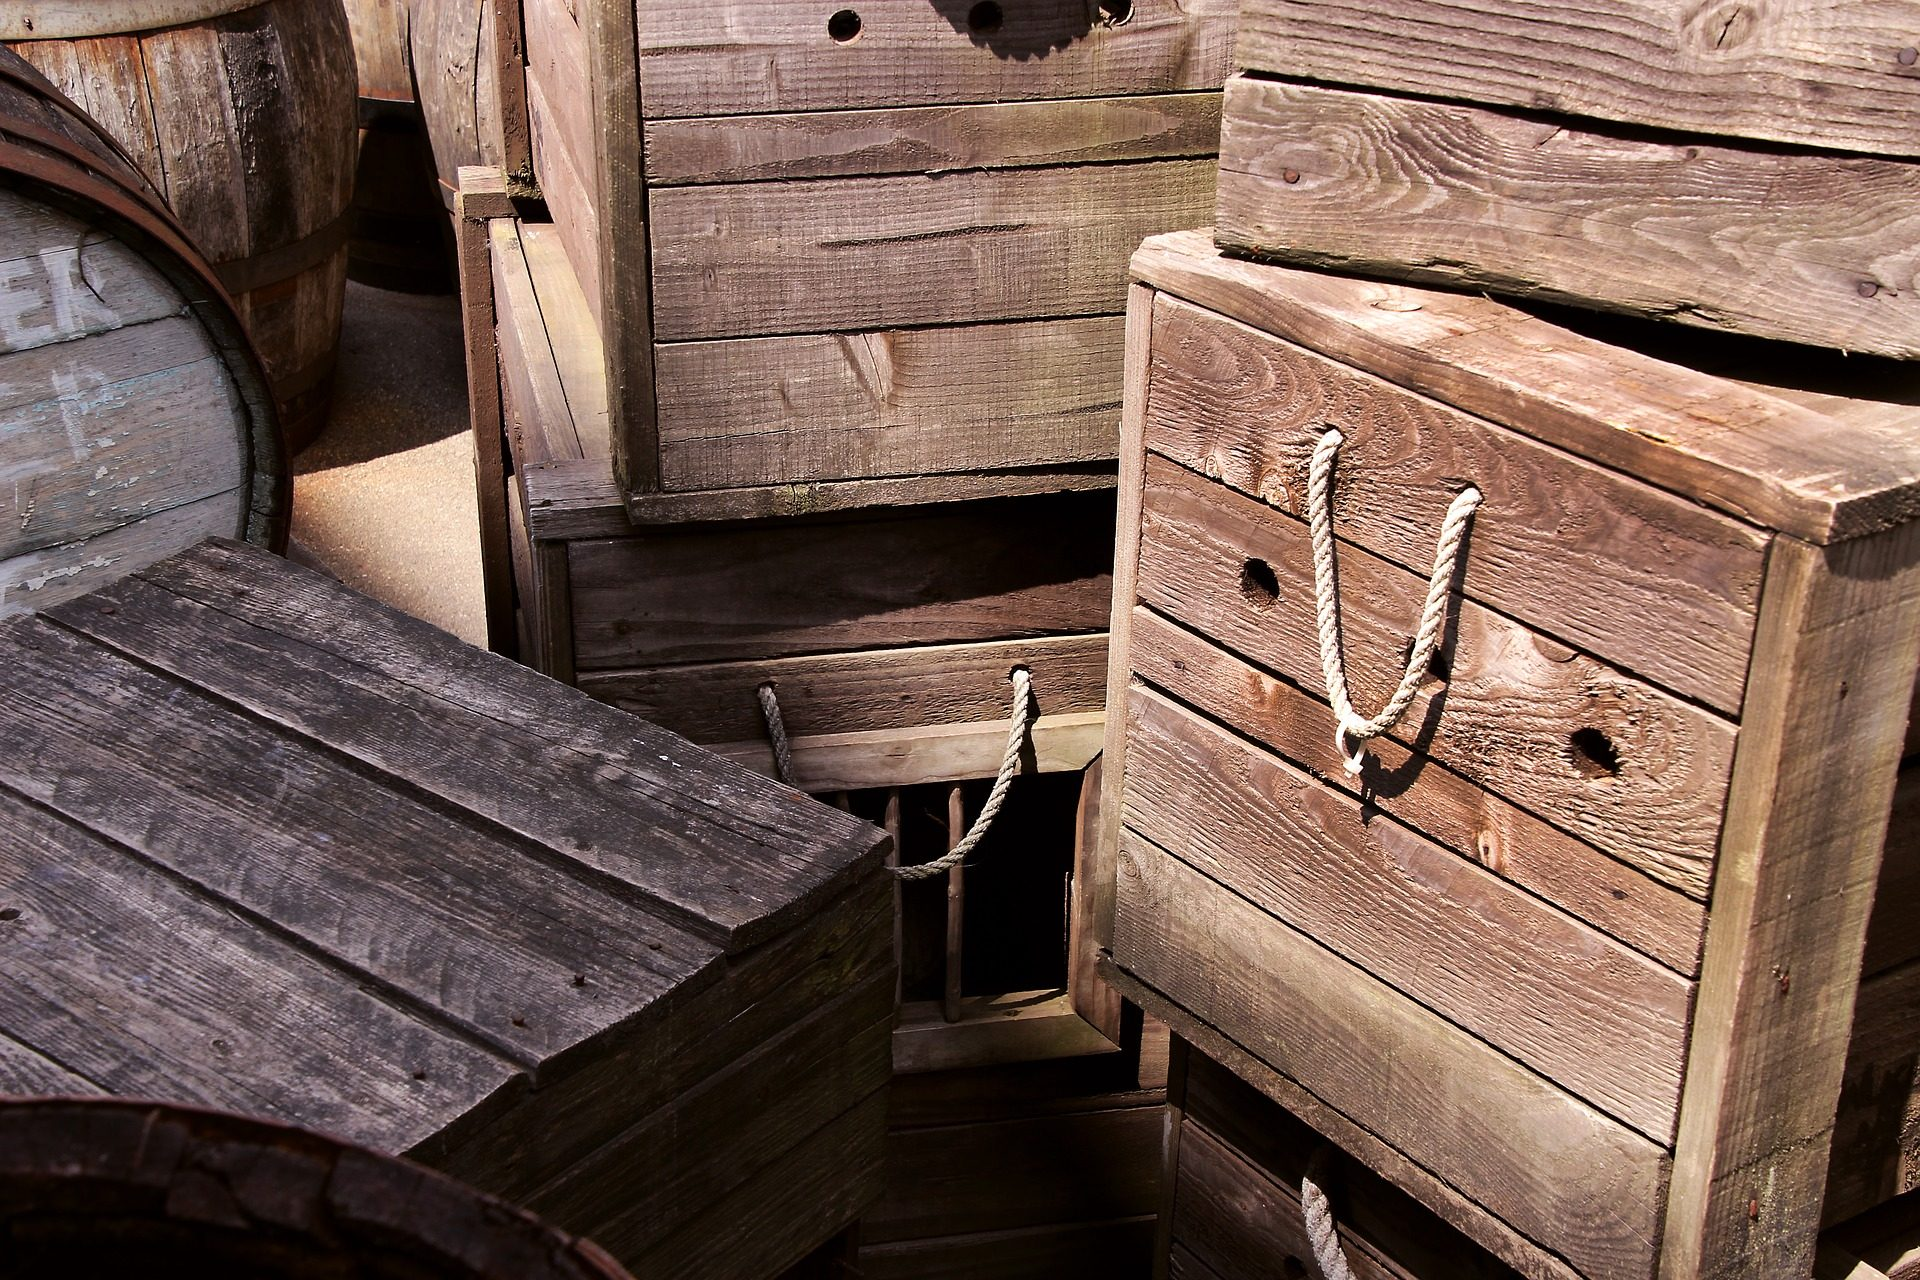 boîtes de, bois, troncs, baril, corde - Fonds d'écran HD - Professor-falken.com